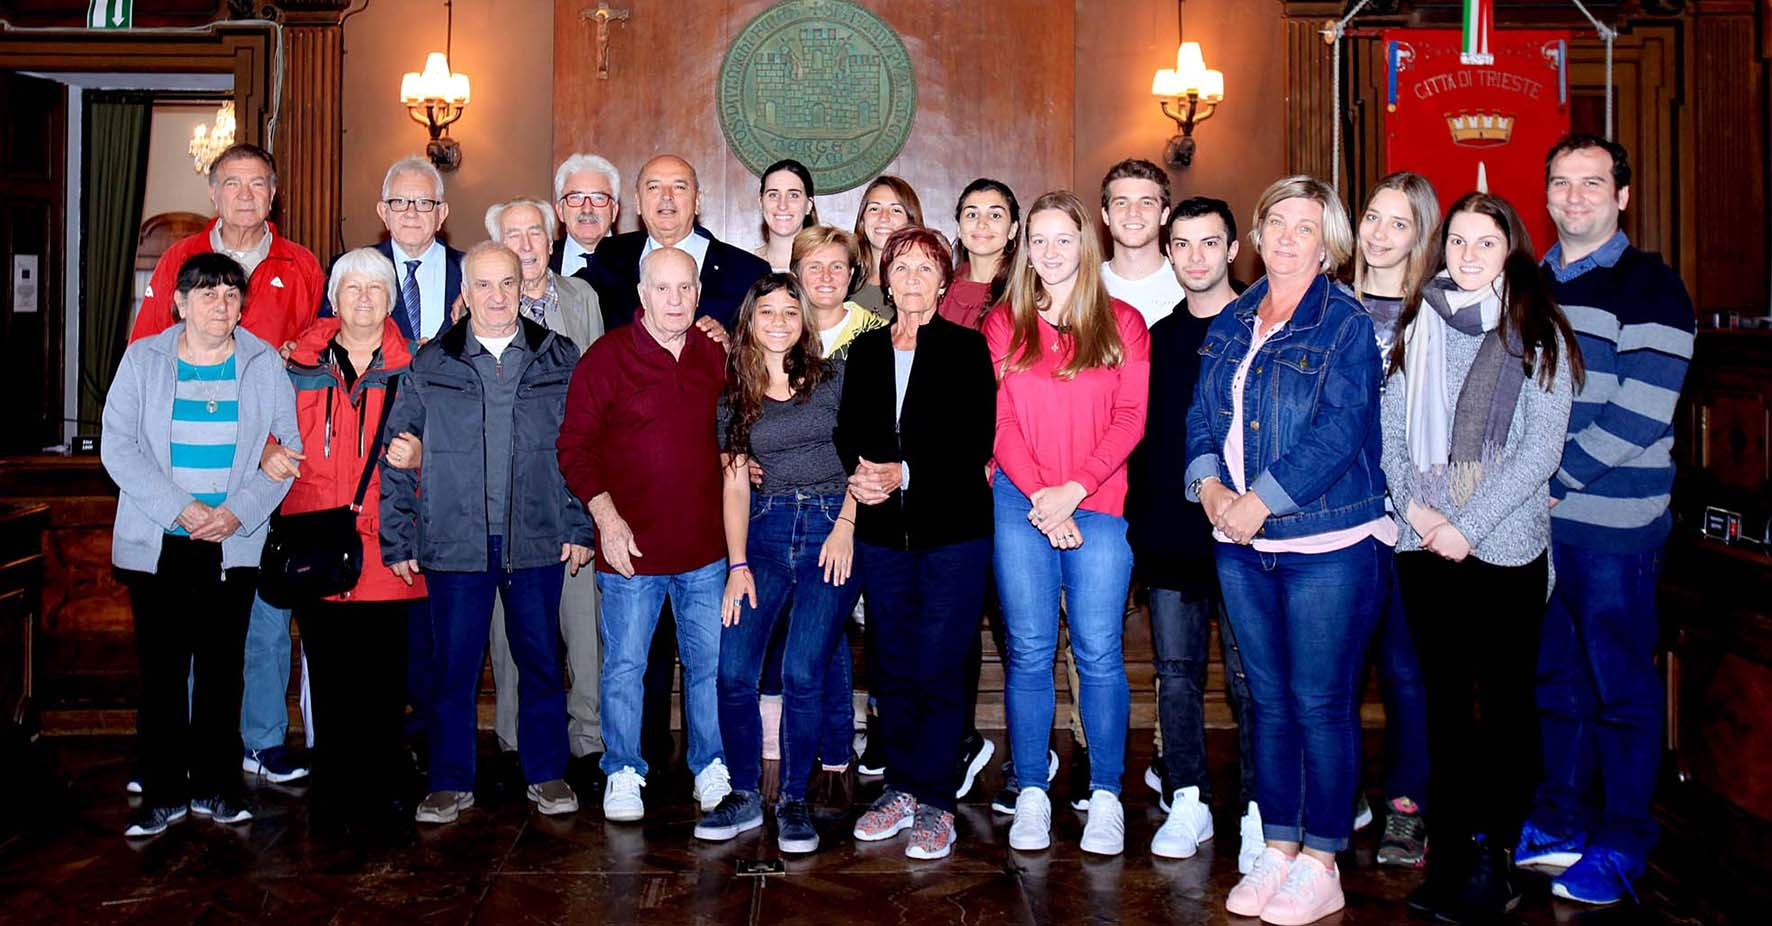 giovani discentendi da emigrai giuliani ricevuti sindaco trieste